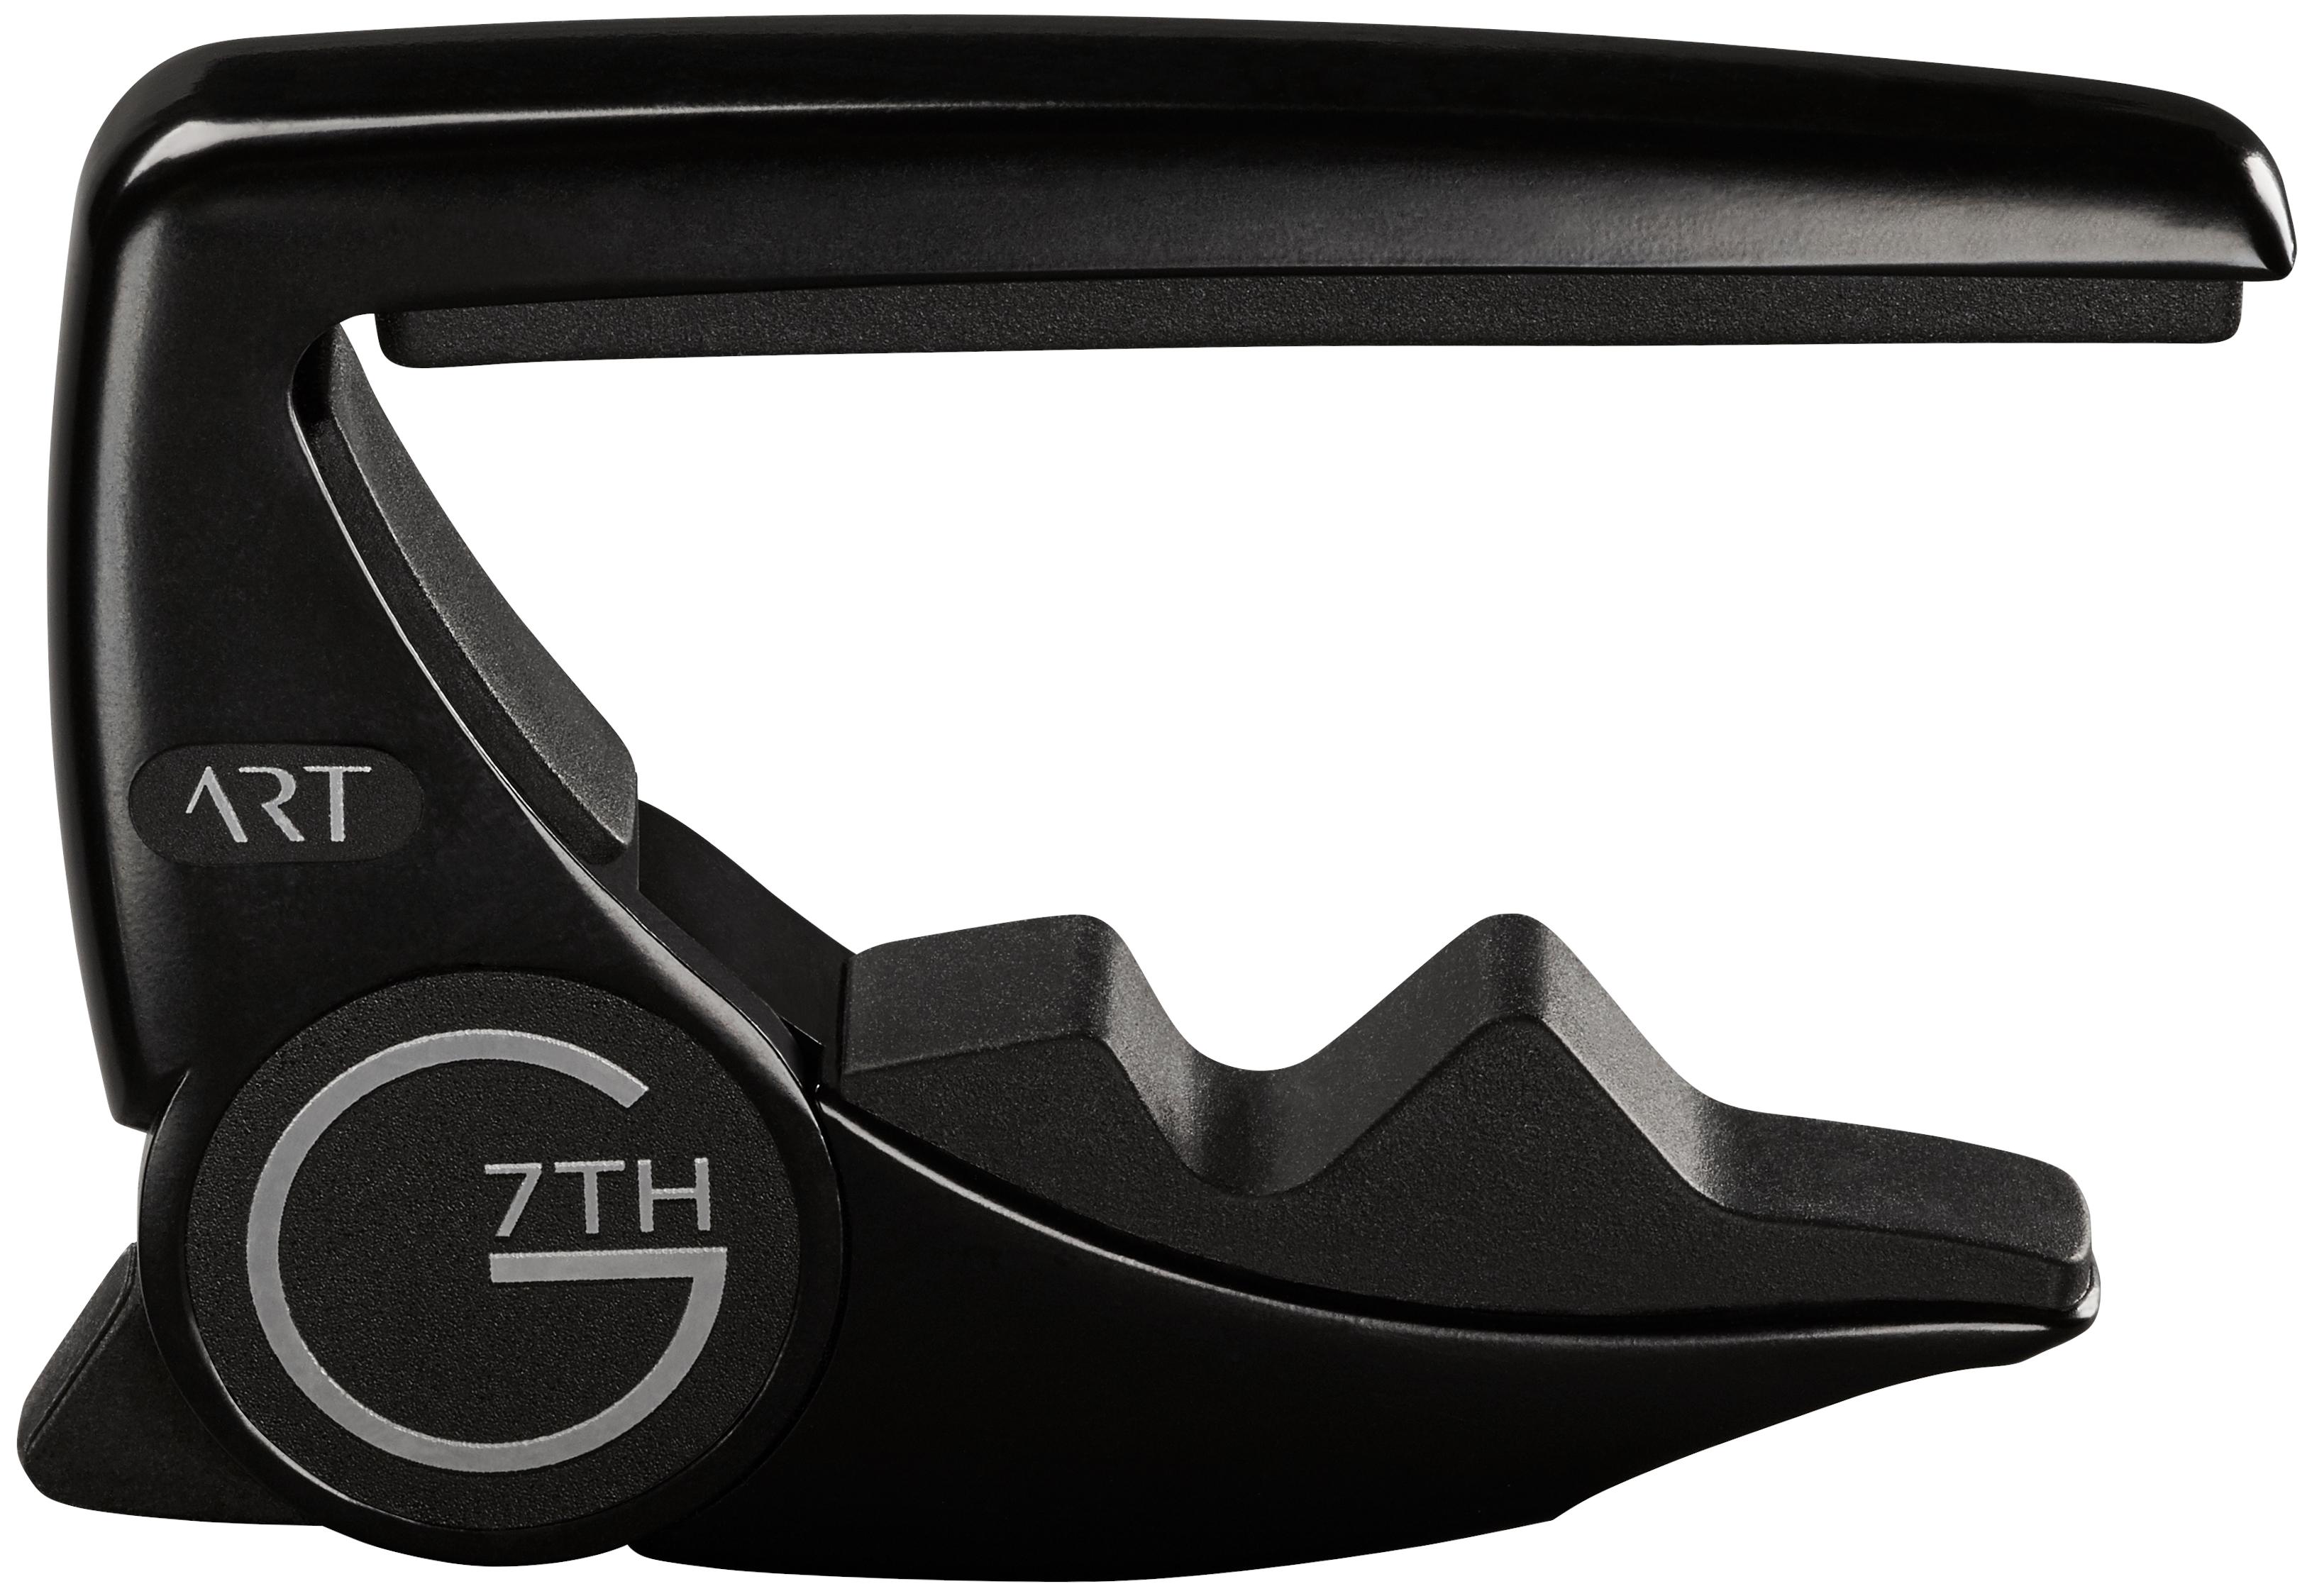 G7TH Performance 3 6-String Black